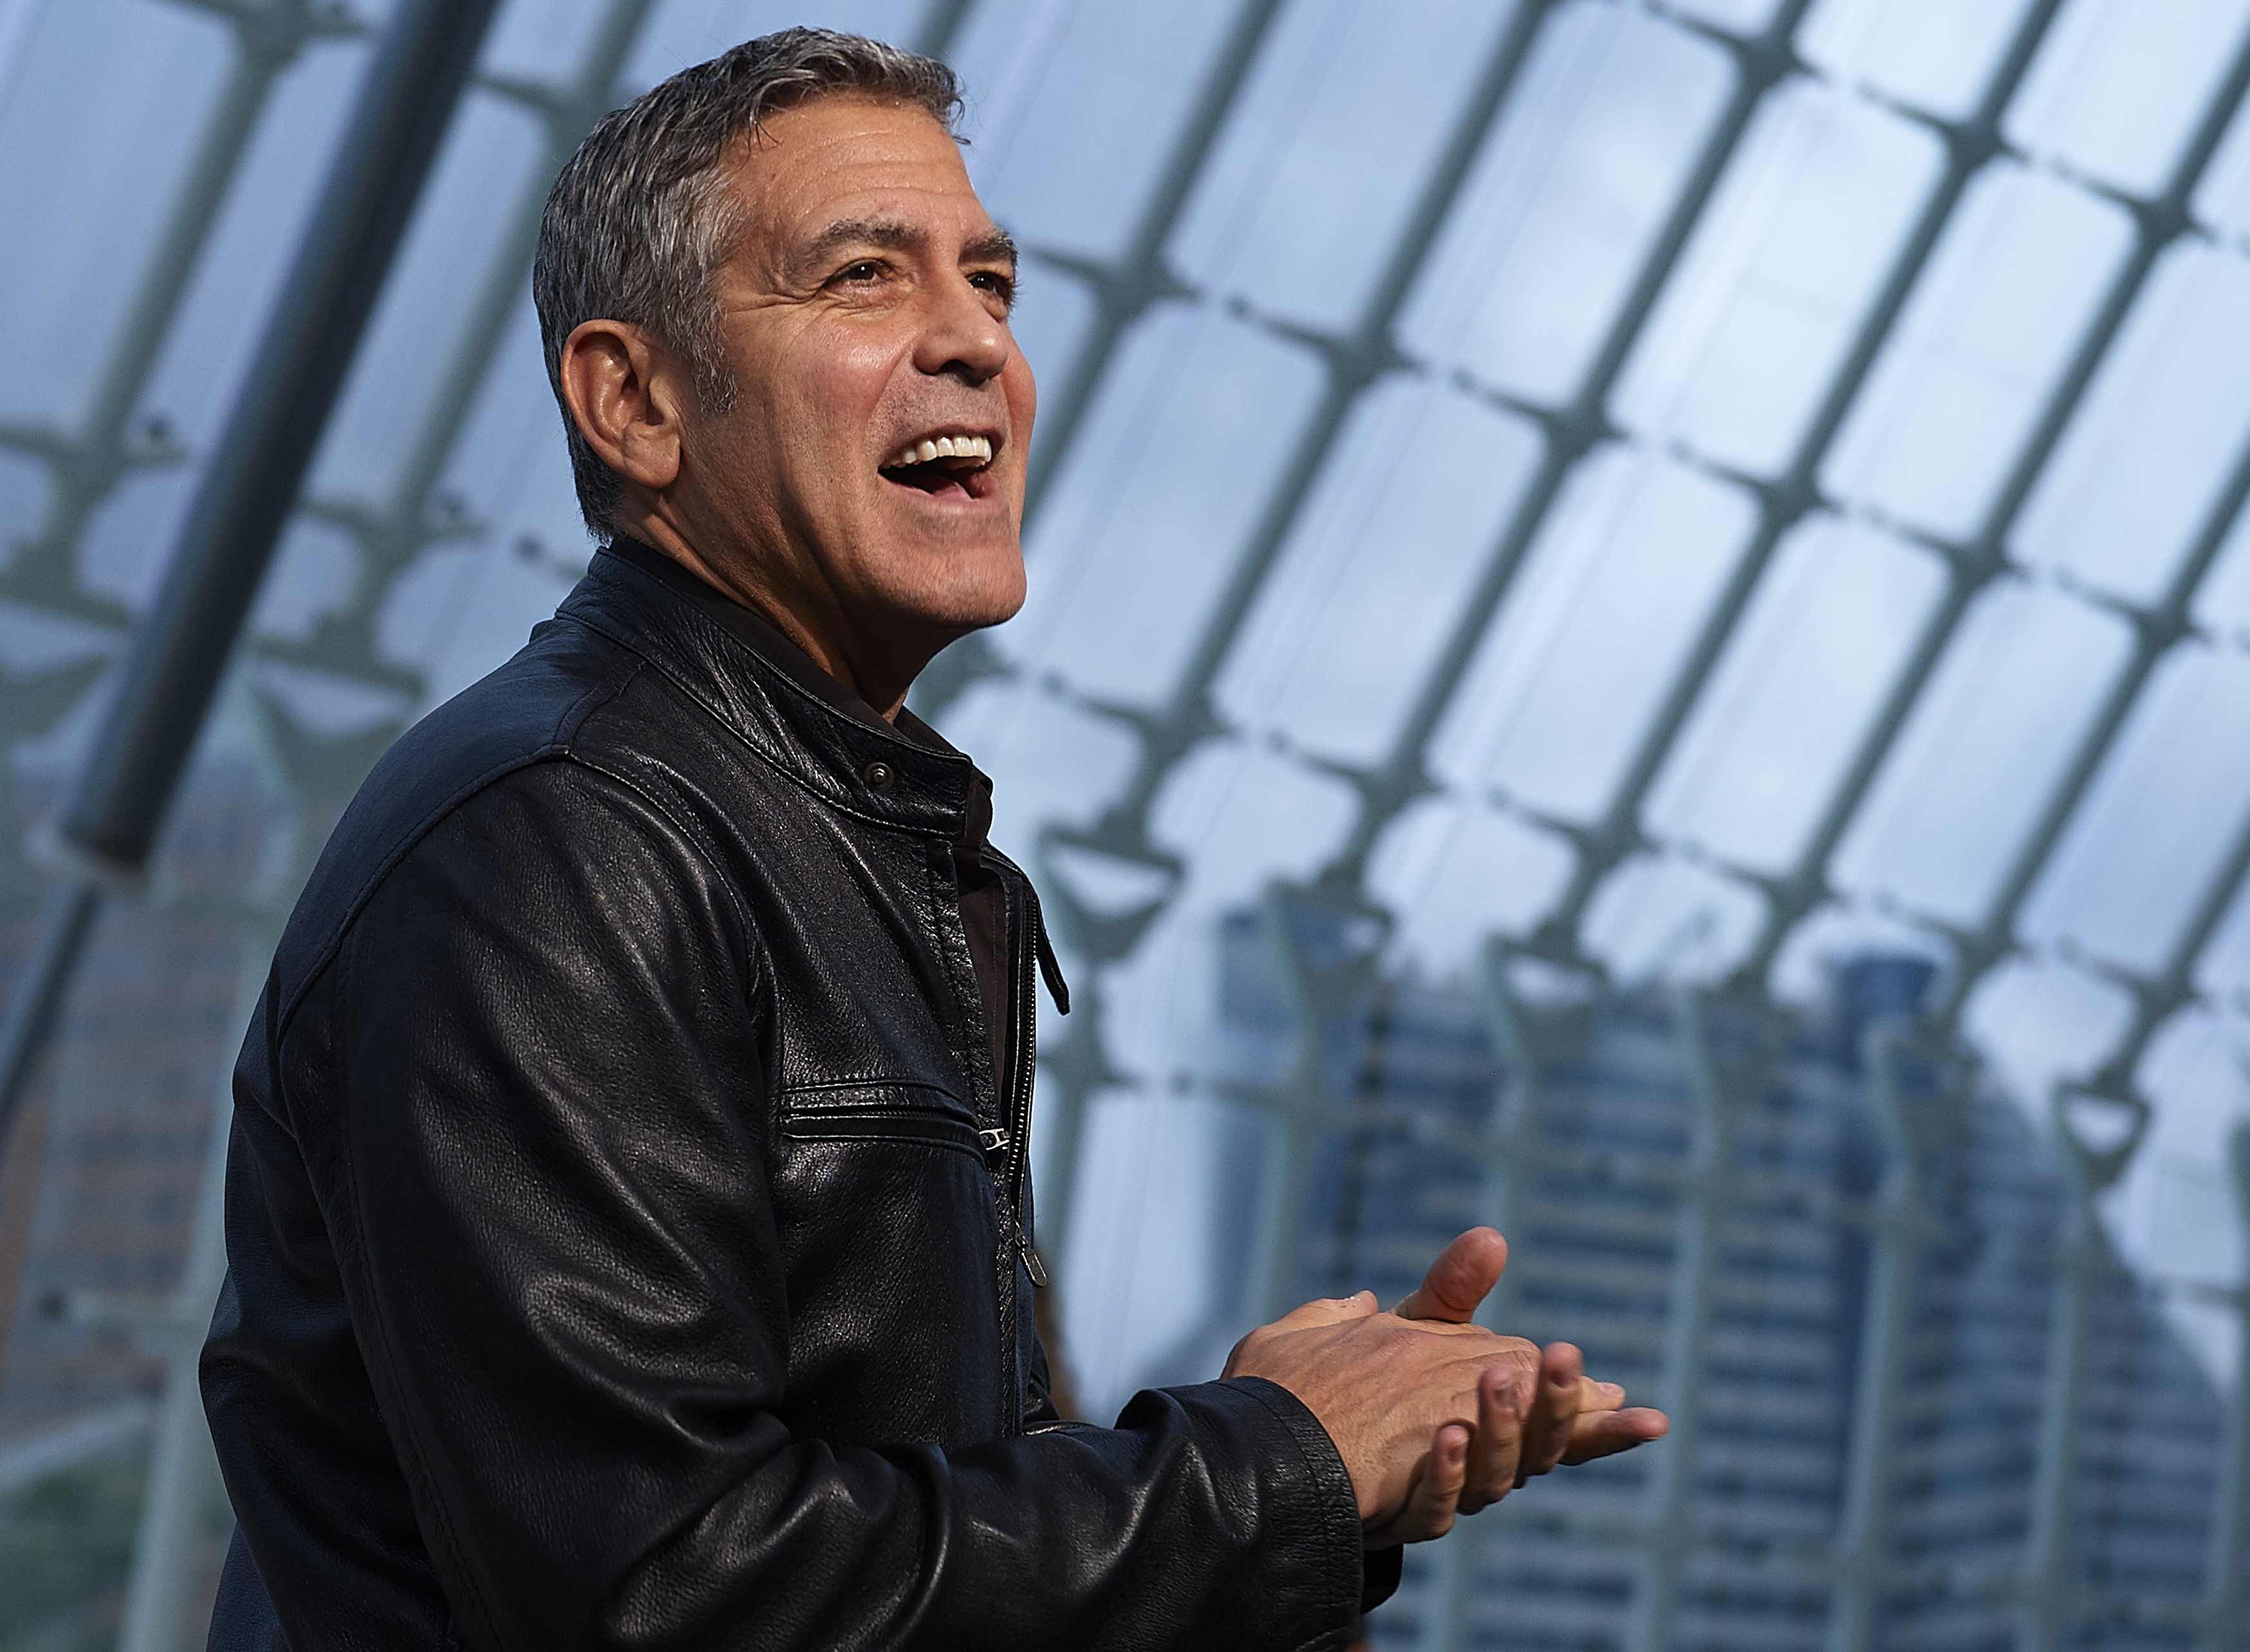 George Clooney Computer Wallpaper